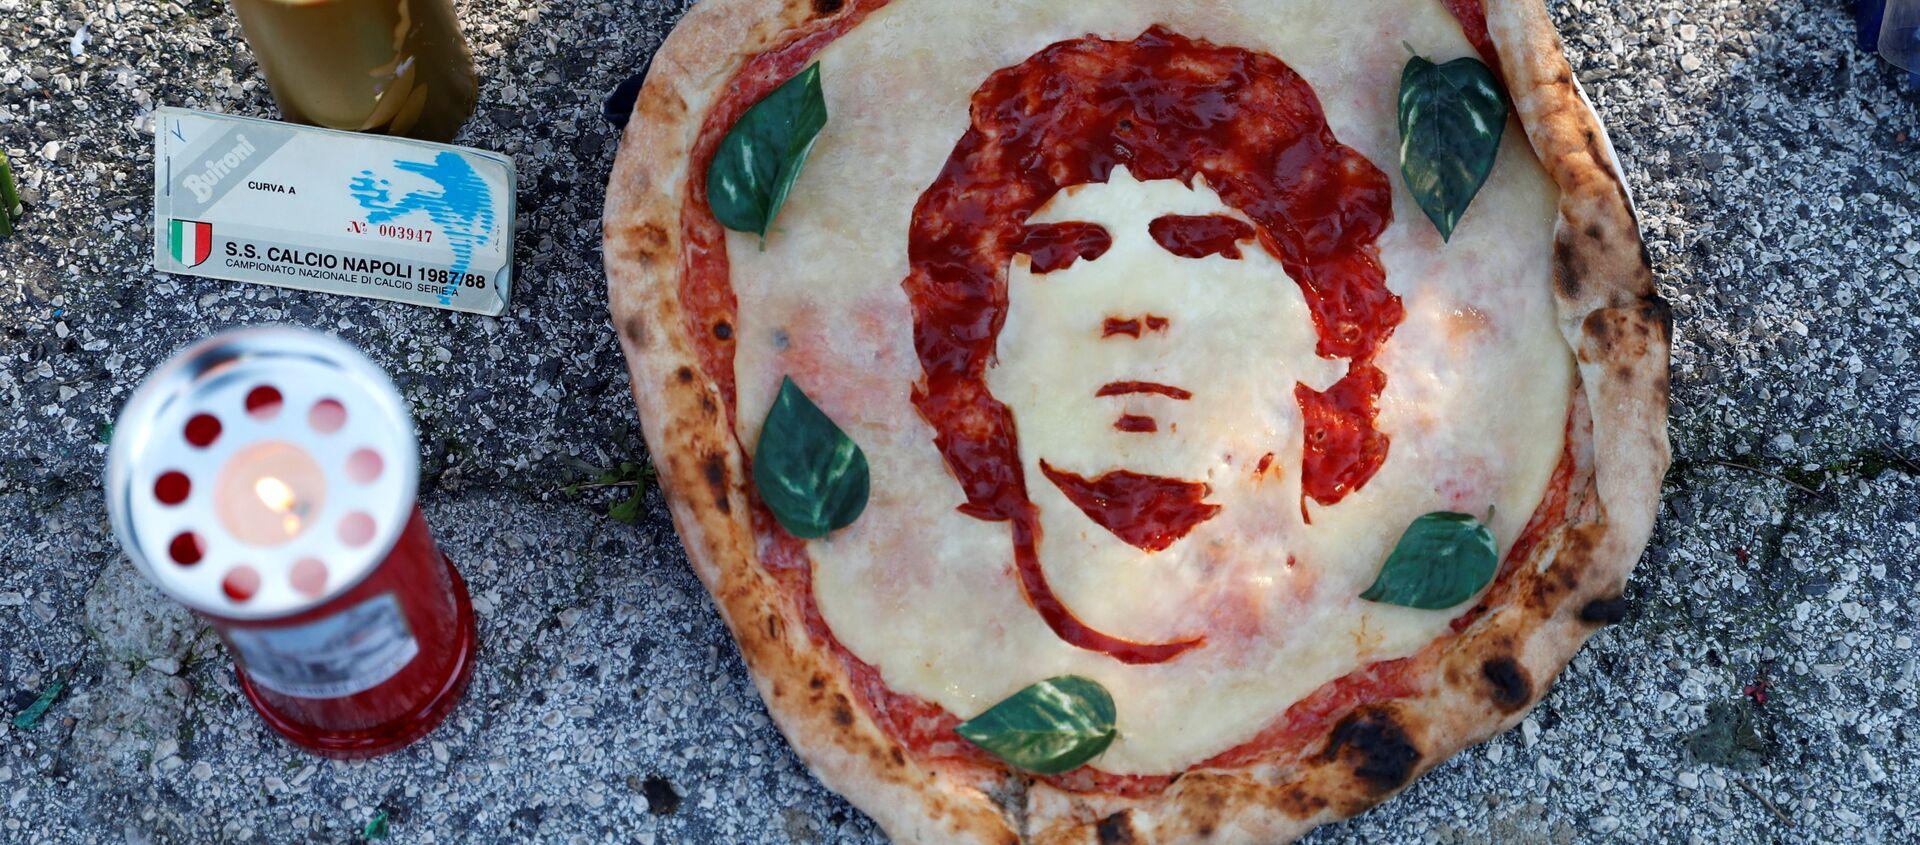 Napoli rende omaggio a Maradona - Sputnik Italia, 1920, 30.11.2020